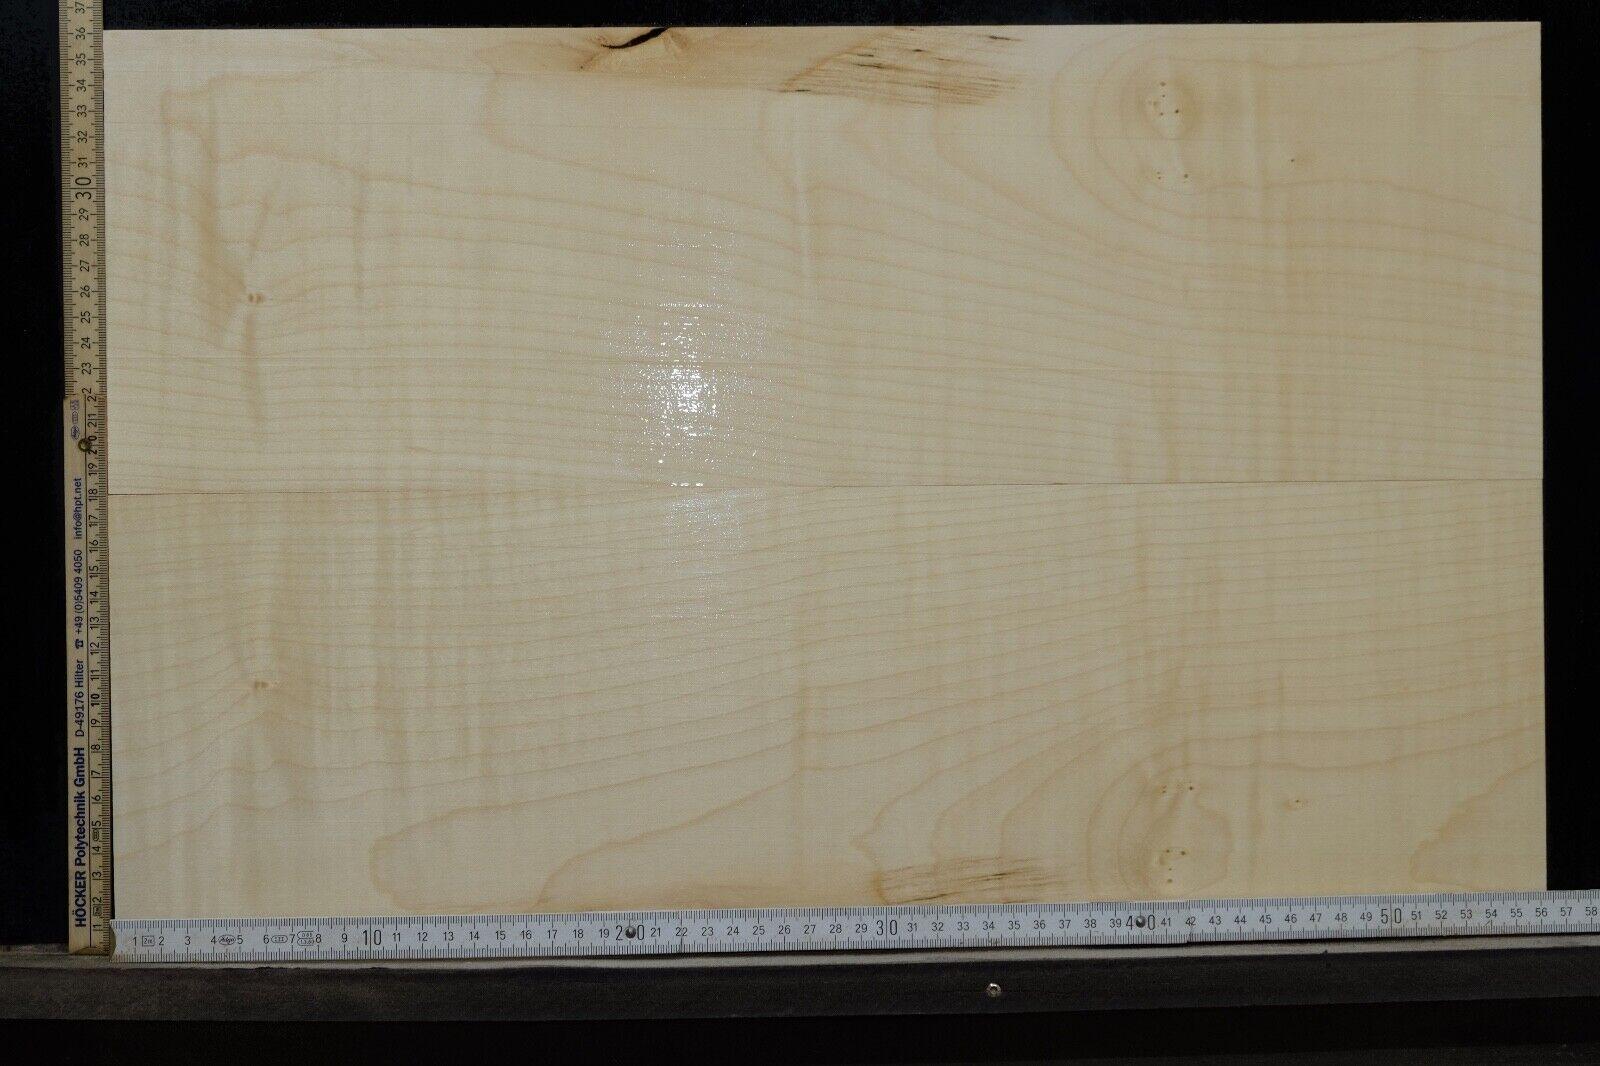 Tonewood Riegel Ahorn Flamed Maple 7,0 mm Aufleimer Guitar Tonholz Droptop 463